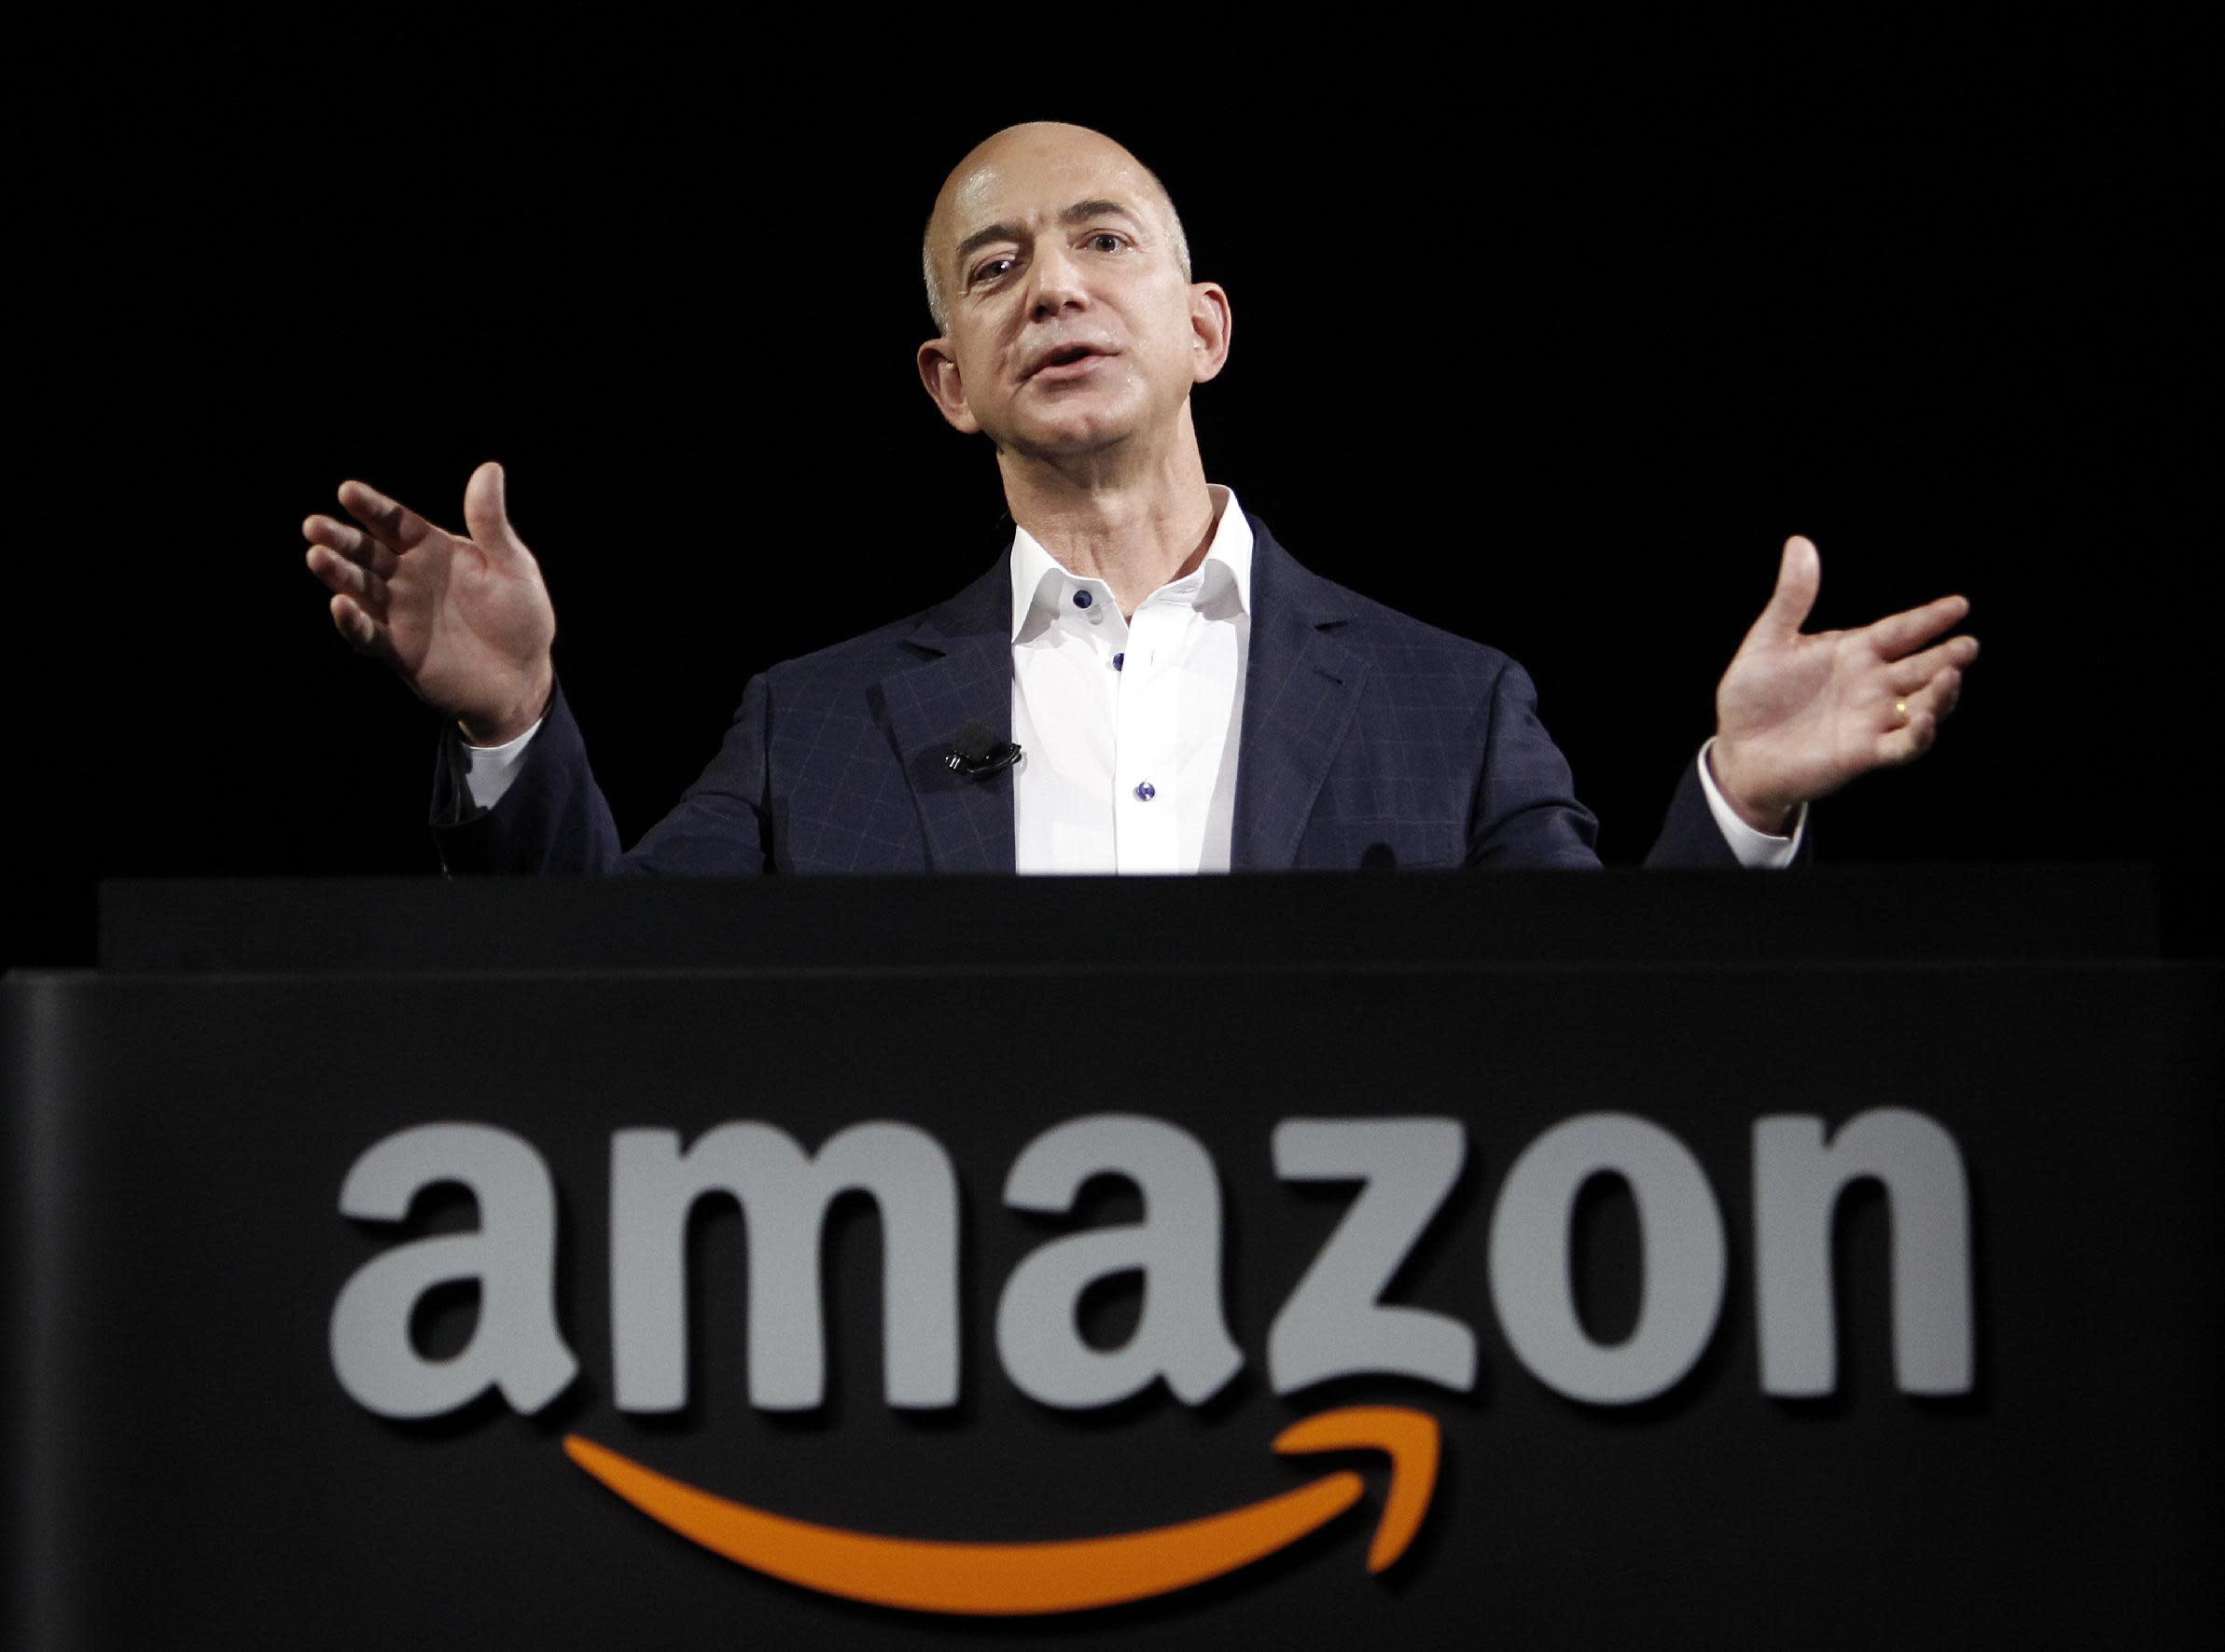 FILE - In this Sept. 6, 2012 file photo, Amazon founder and CEO Jeff Bezos speaks in Santa Monica, Calif. Bezos plans to buy The Washington Post for $250 million. (AP Photo/Reed Saxon, File)